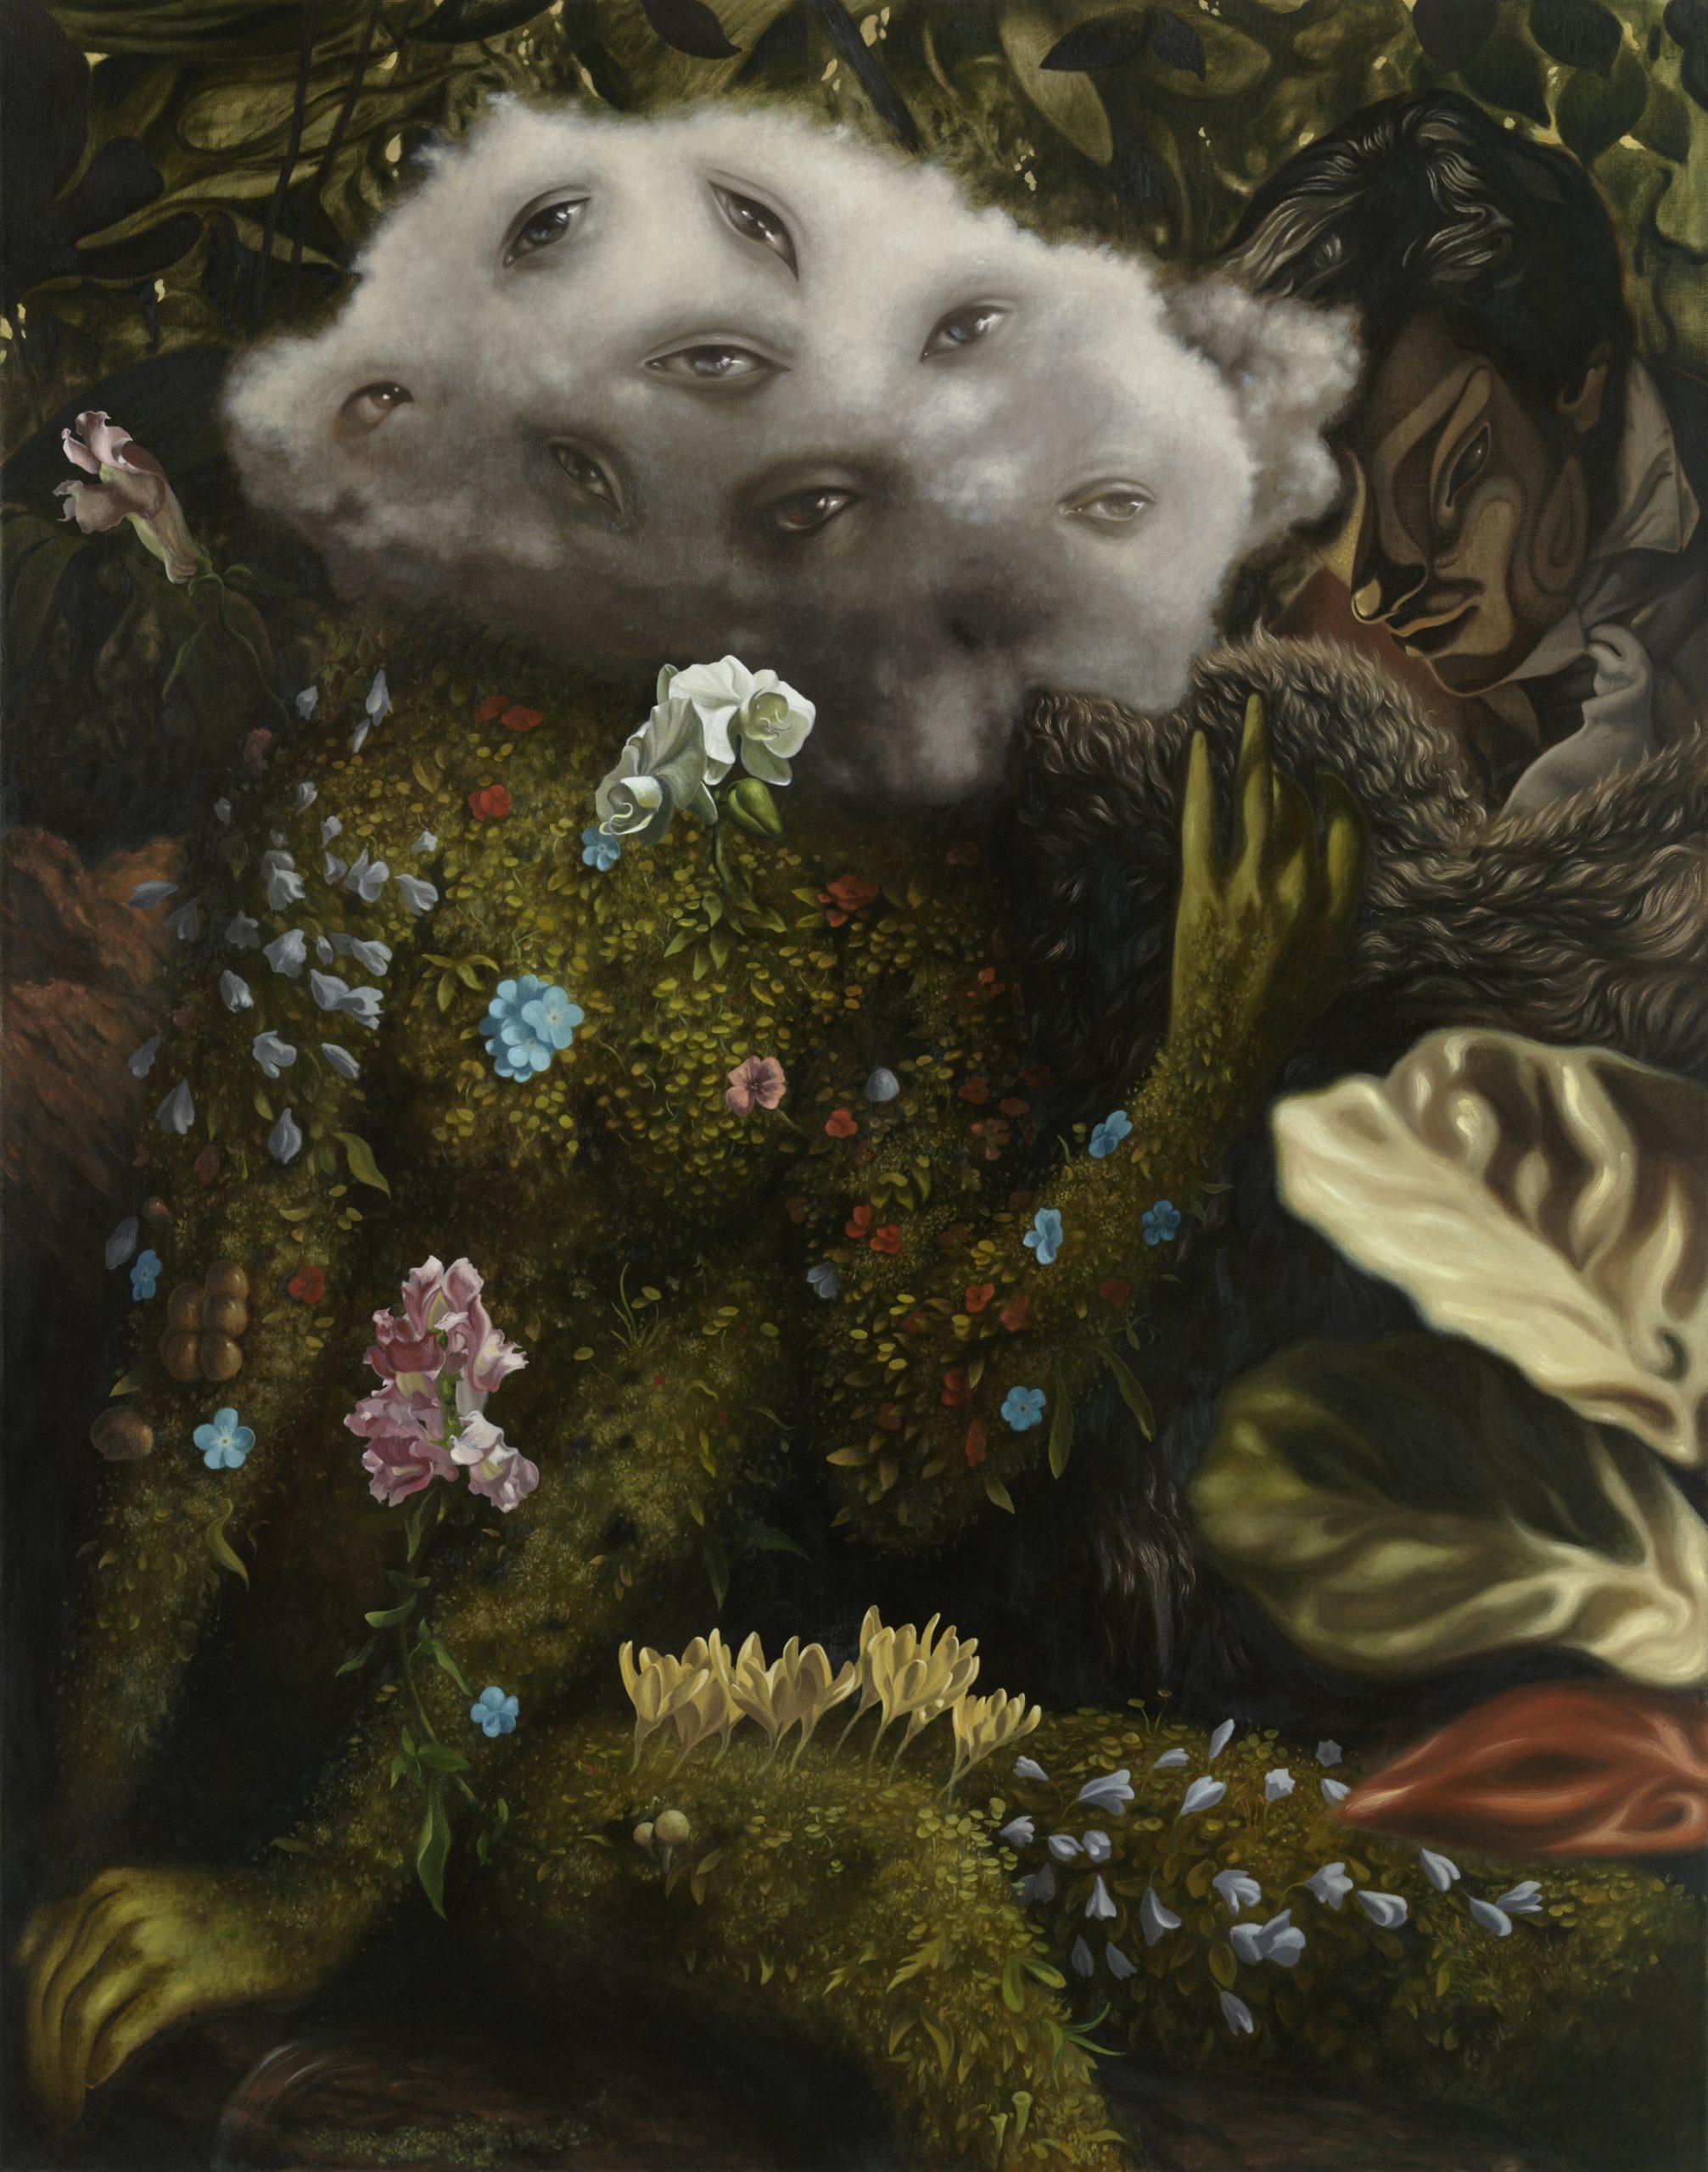 Dennis Scholl Jardin Jaune Artist Painting